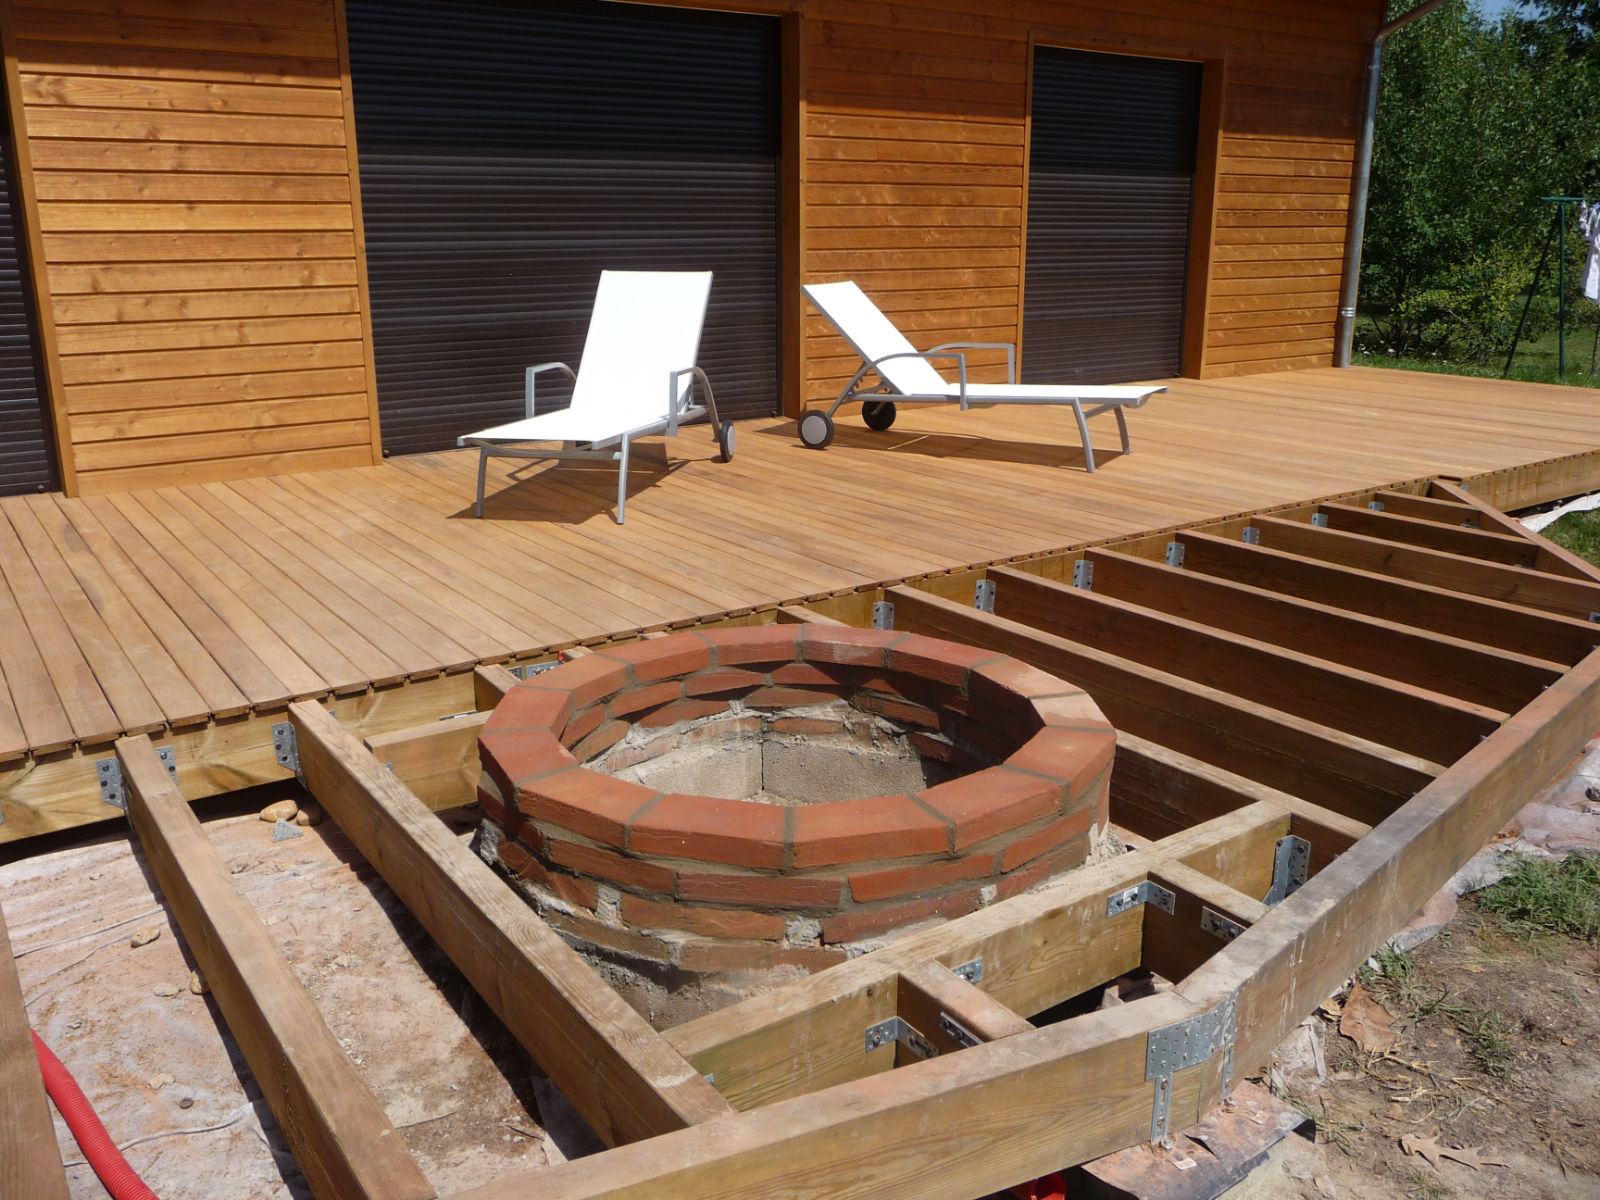 construction d 39 une terrasse en bois. Black Bedroom Furniture Sets. Home Design Ideas